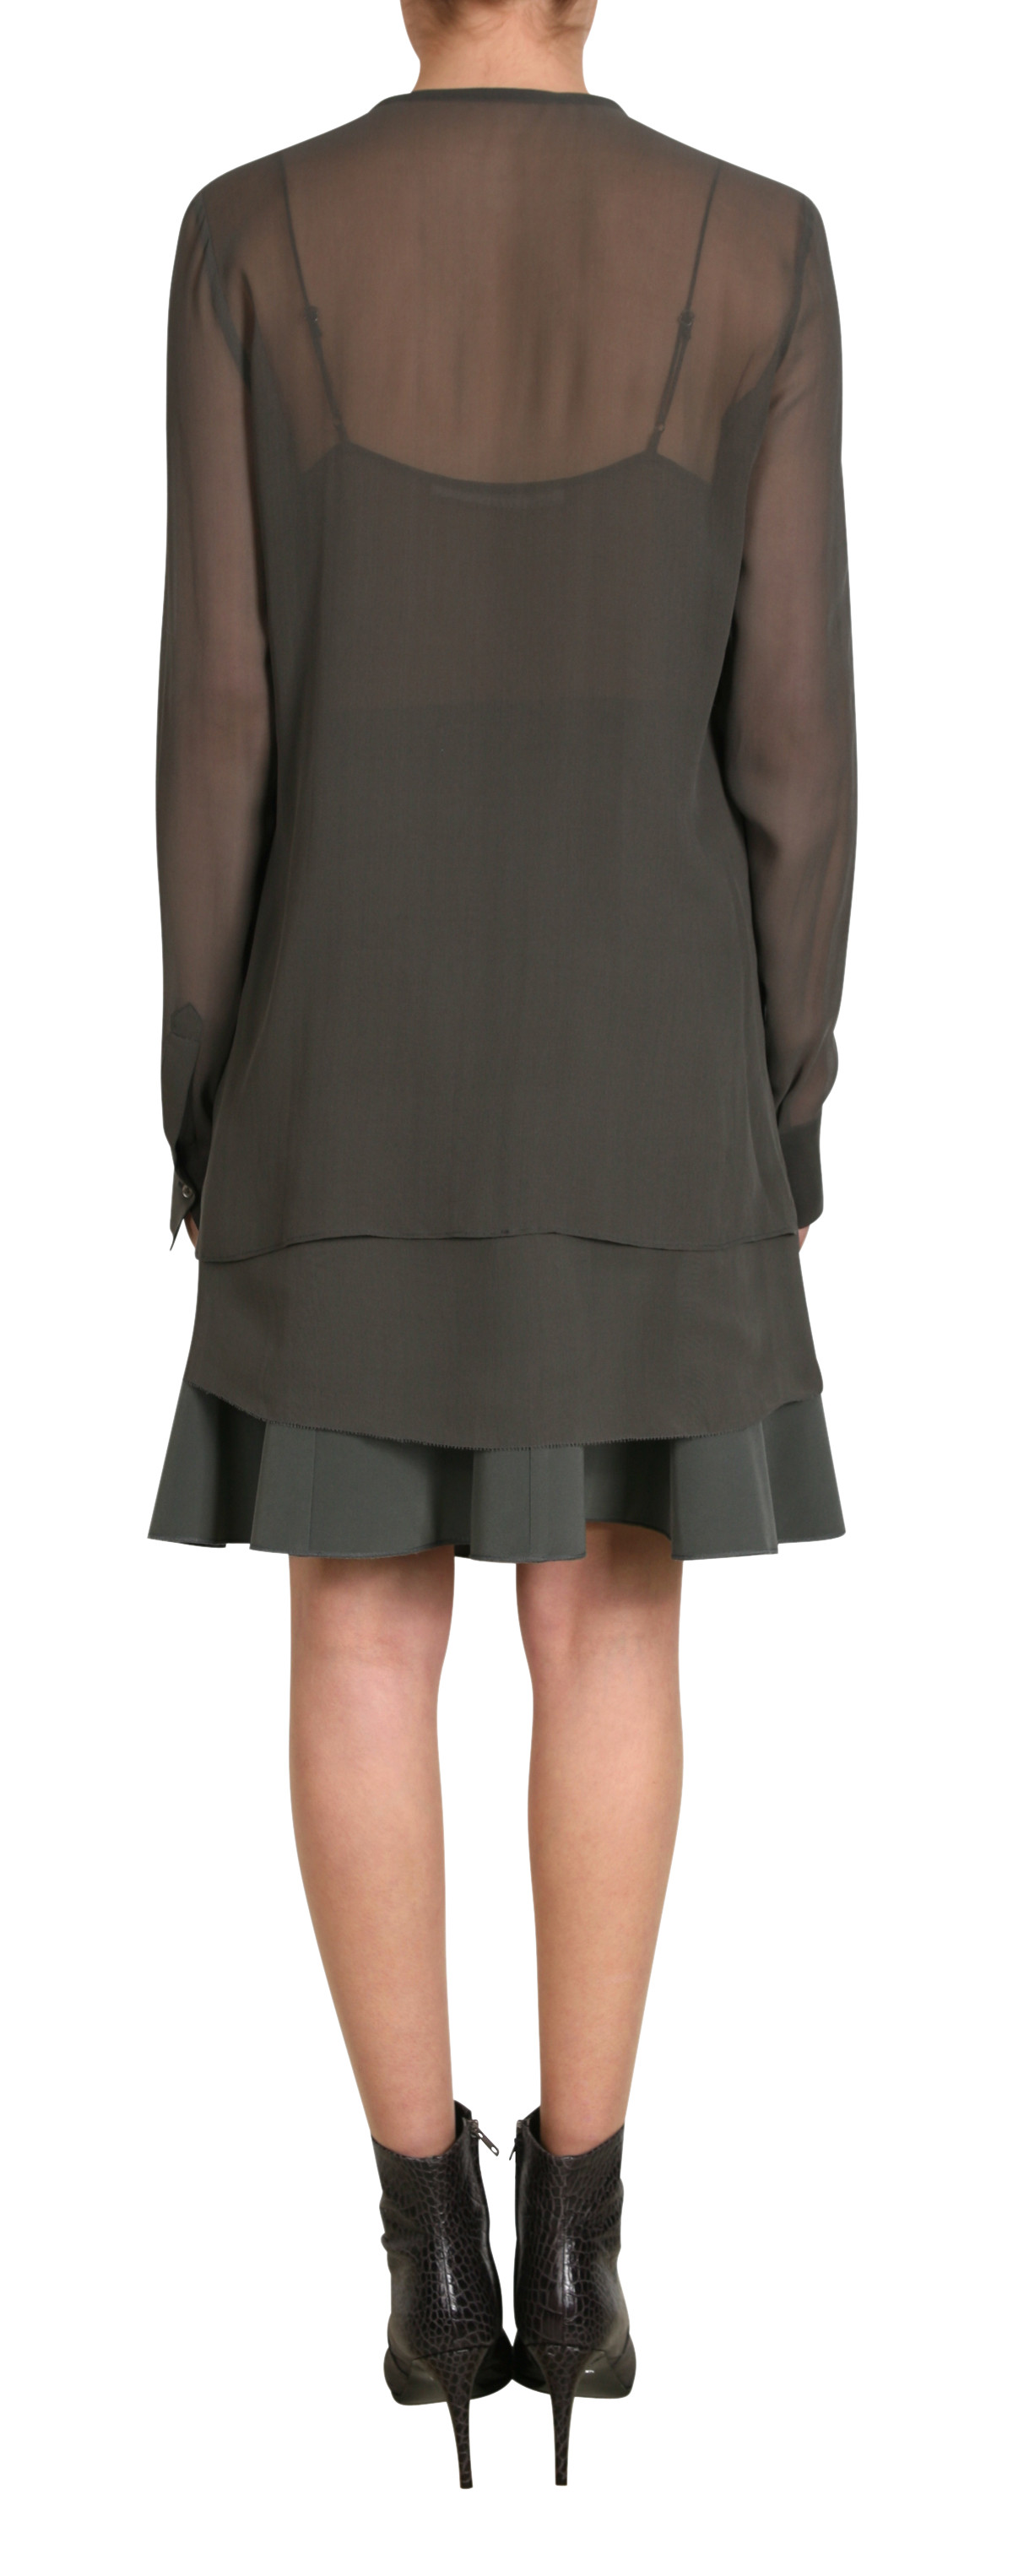 CRYSTAL ROCK blouse 1/1 - Blouses - Clothing - Onlineshop   SCHUMACHER - Onlineshop